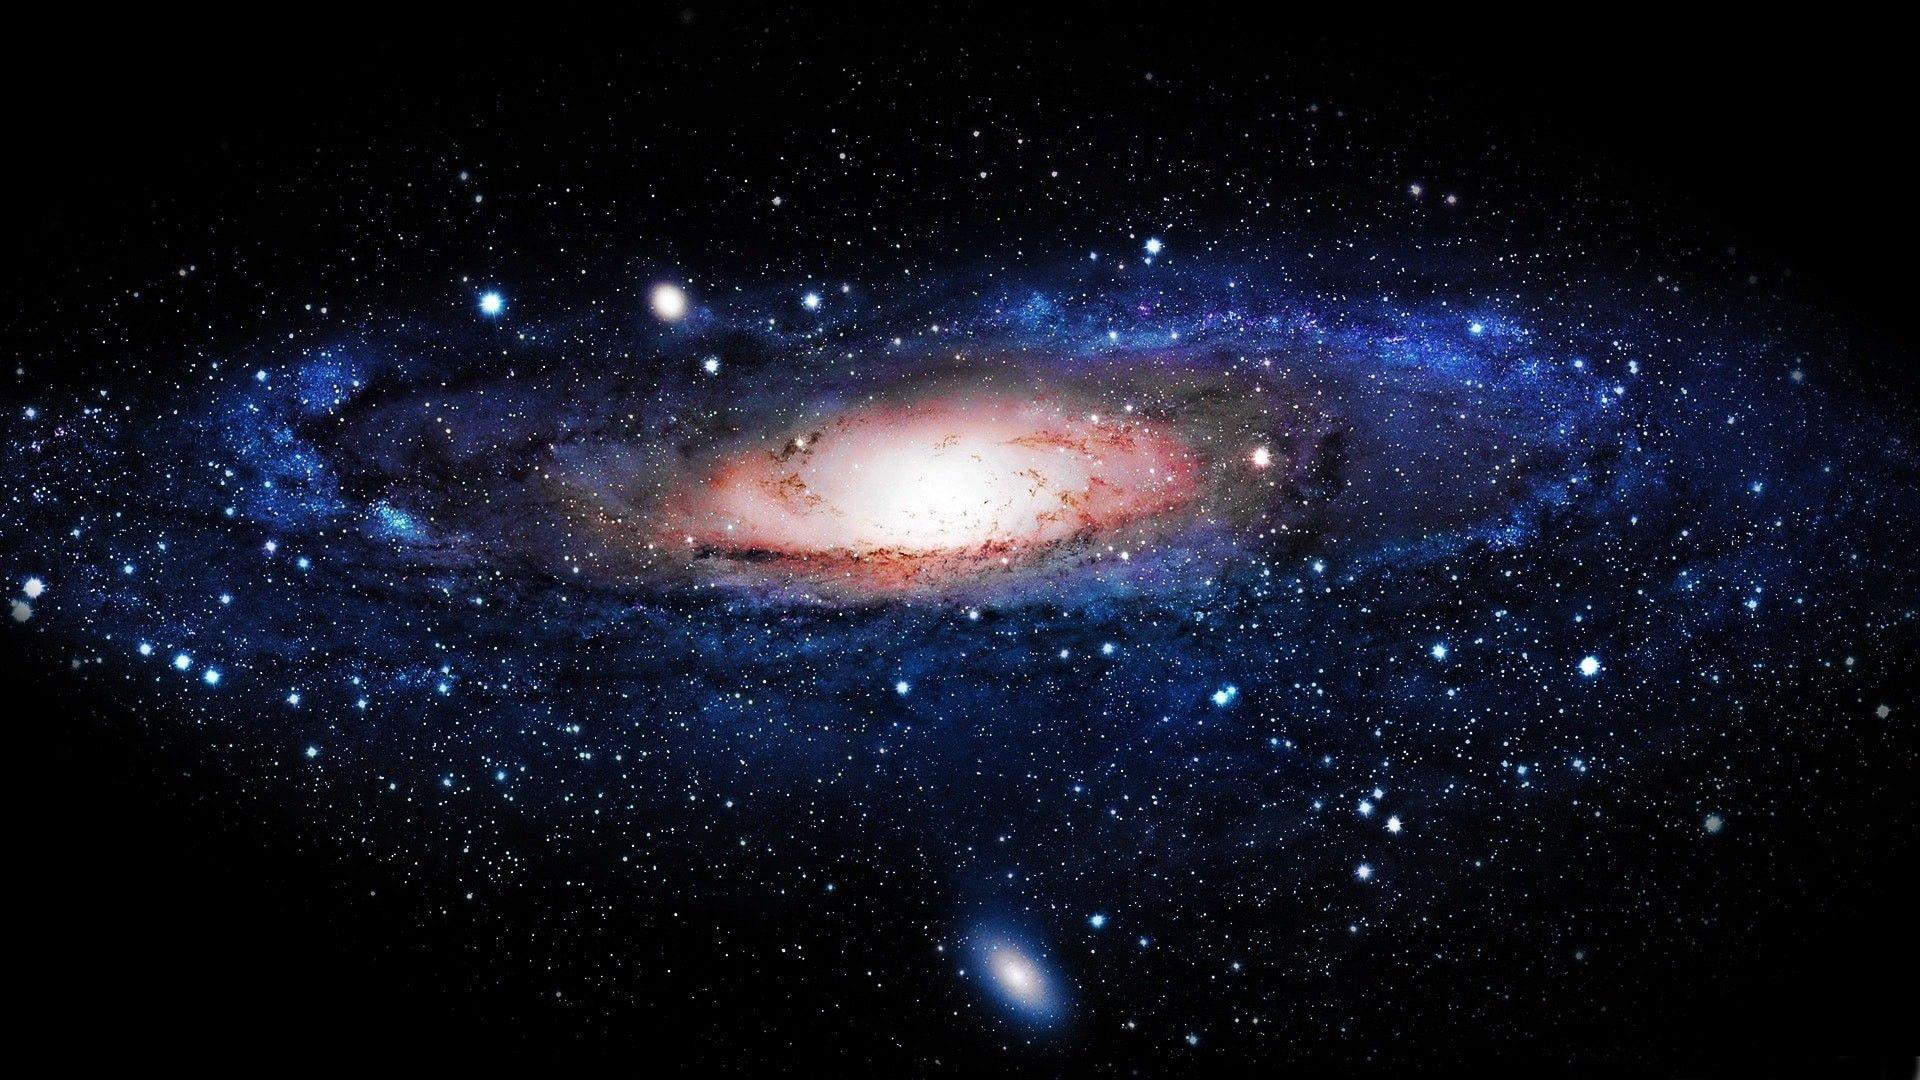 1920x1080 Milky Way Hd Pics Milky Way Wallpapers Hd Galaxy